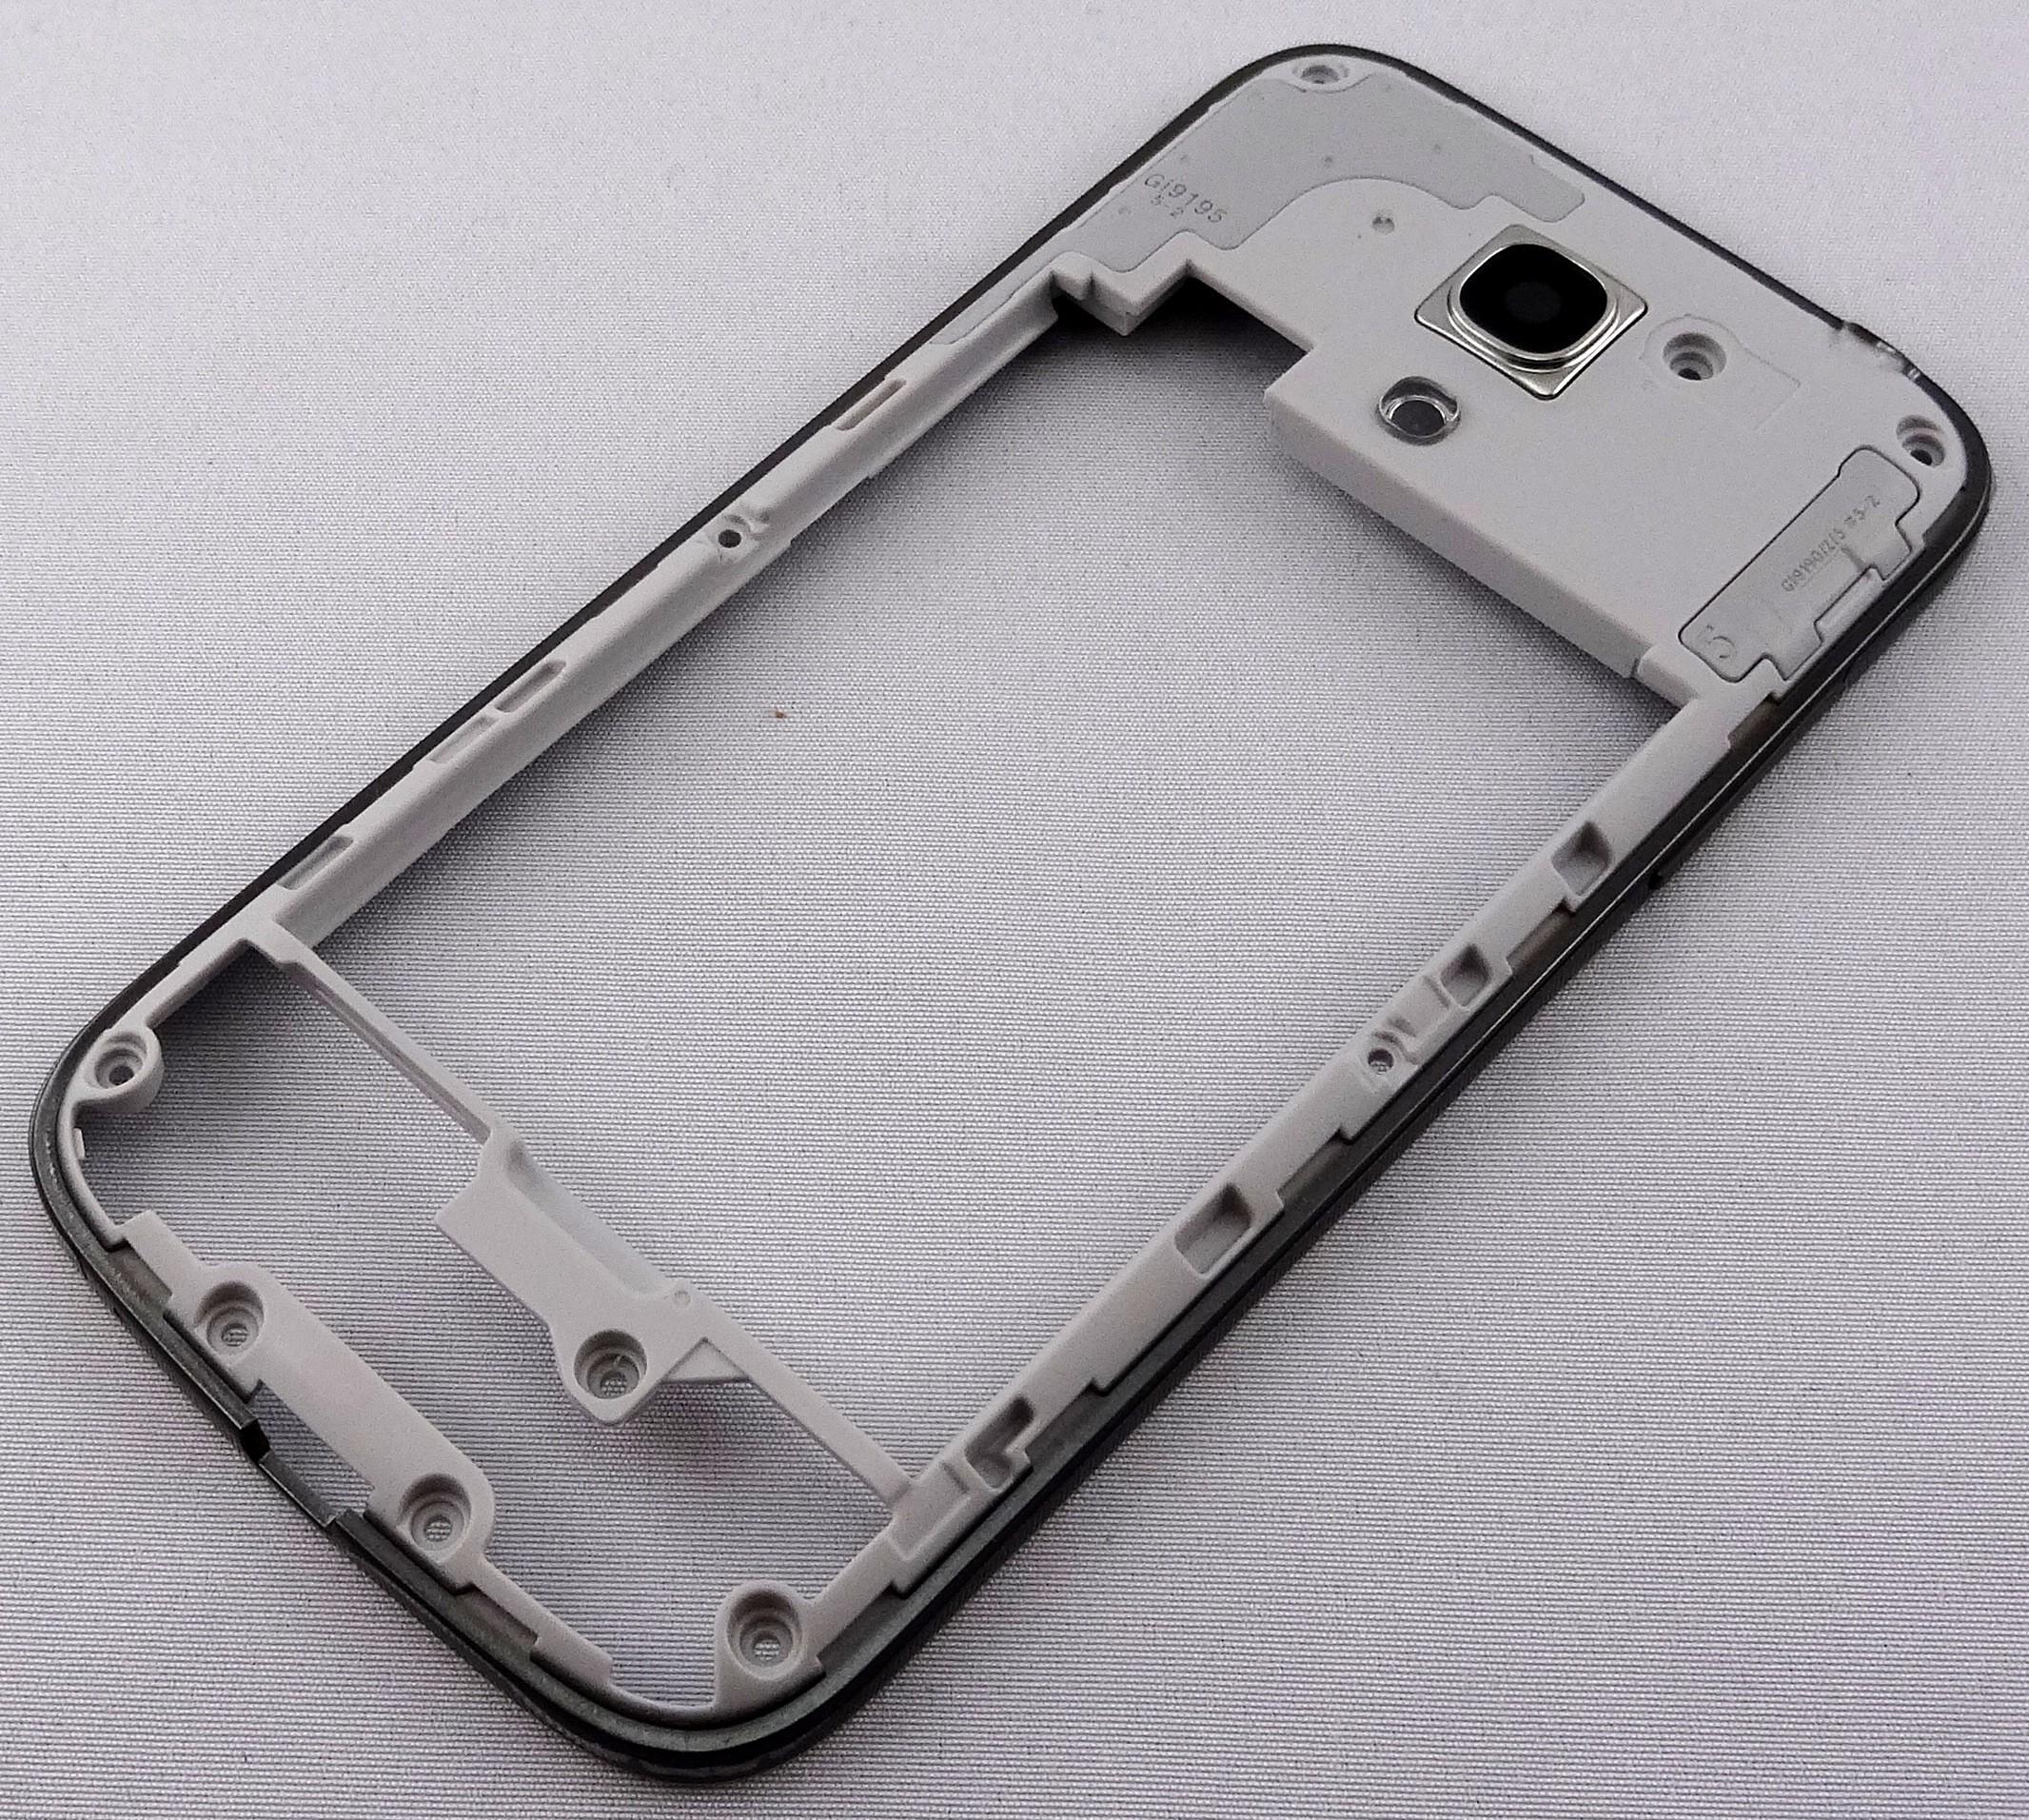 Original Rahmen für Samsung Galaxy S4 mini Black Edition - MobileGSM